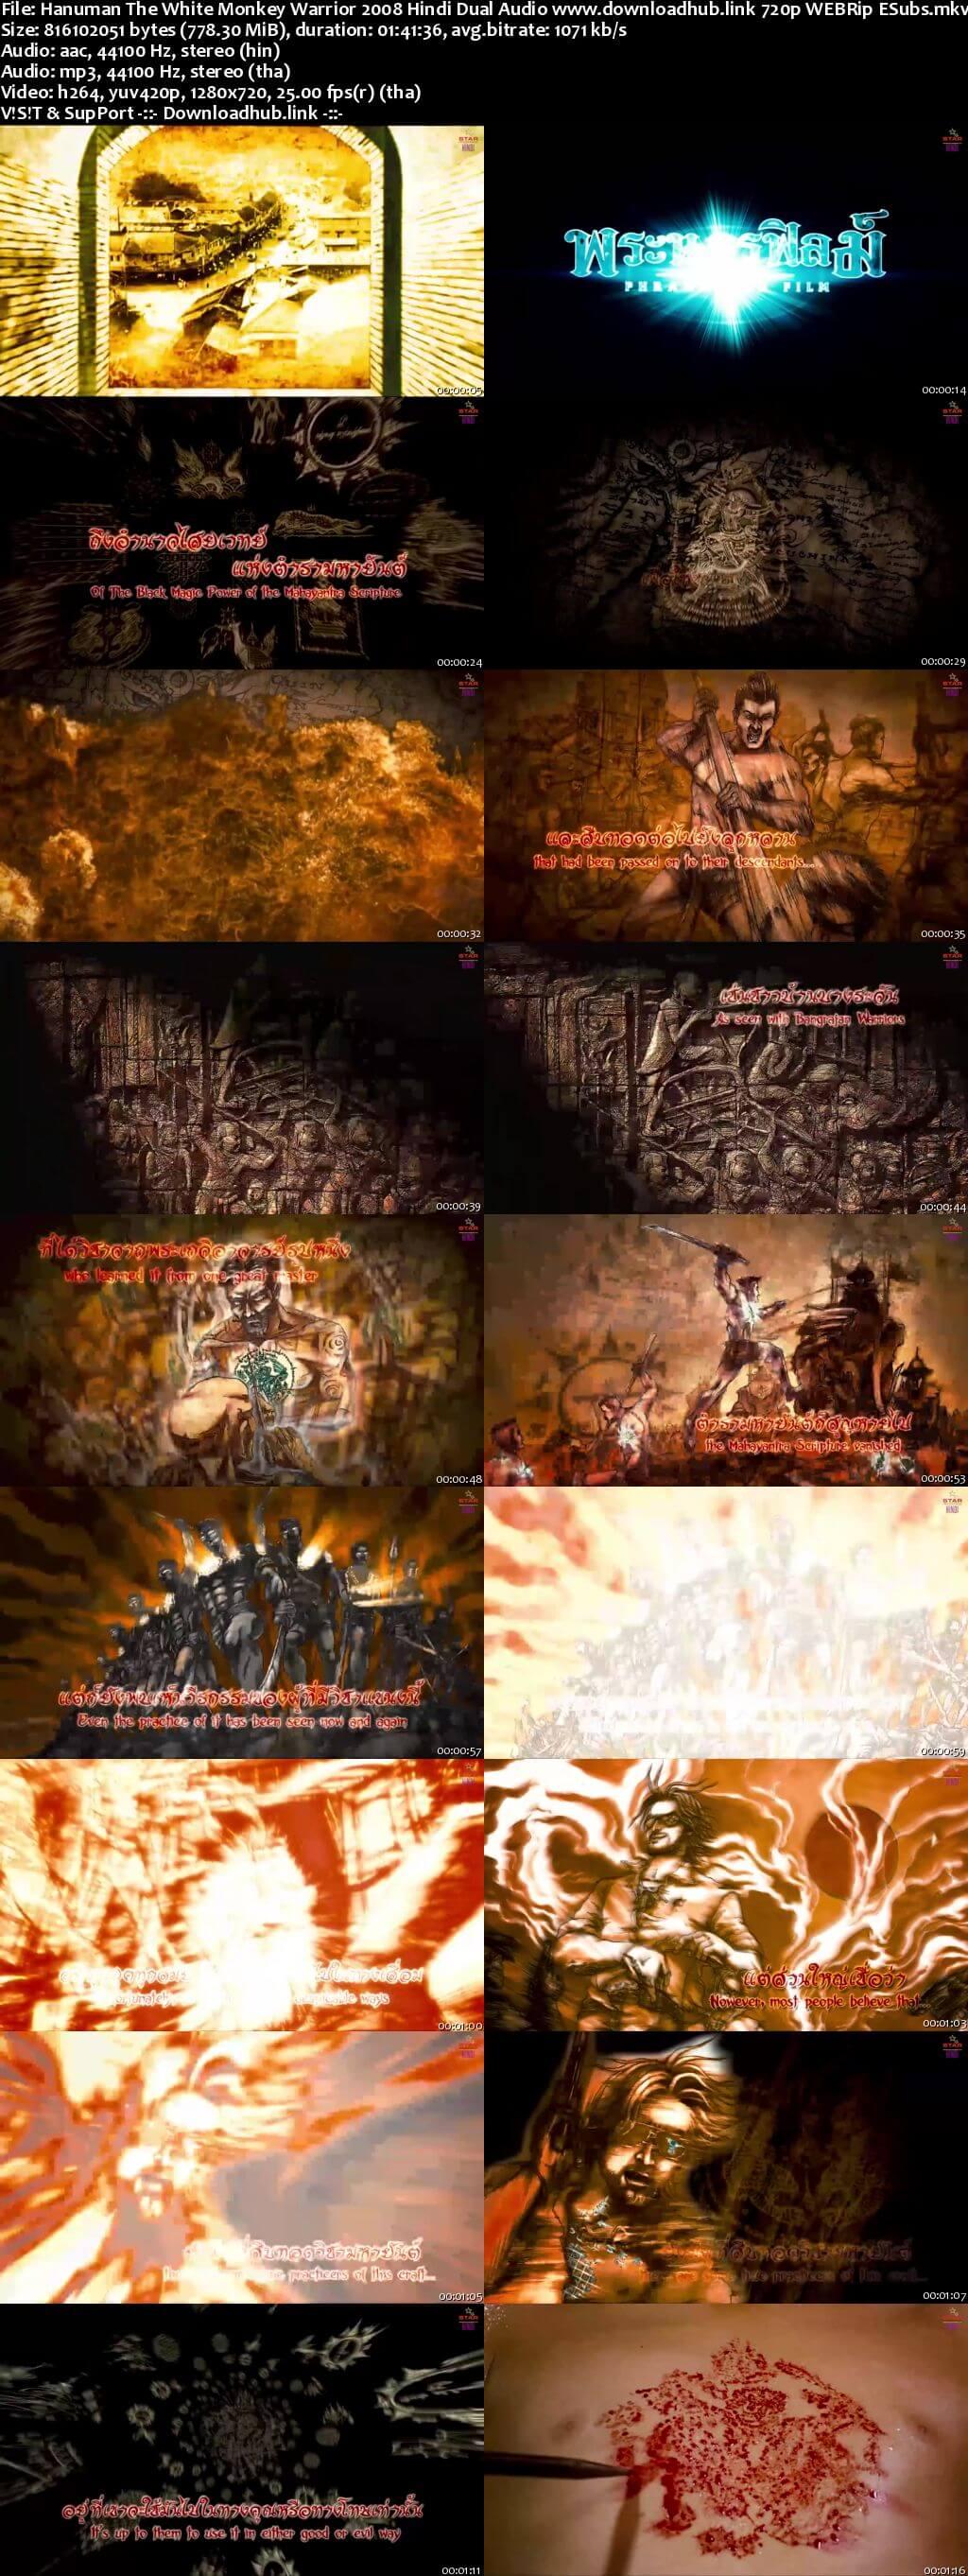 Hanuman The White Monkey Warrior 2008 Hindi Dual Audio 720p WEBRip ESubs